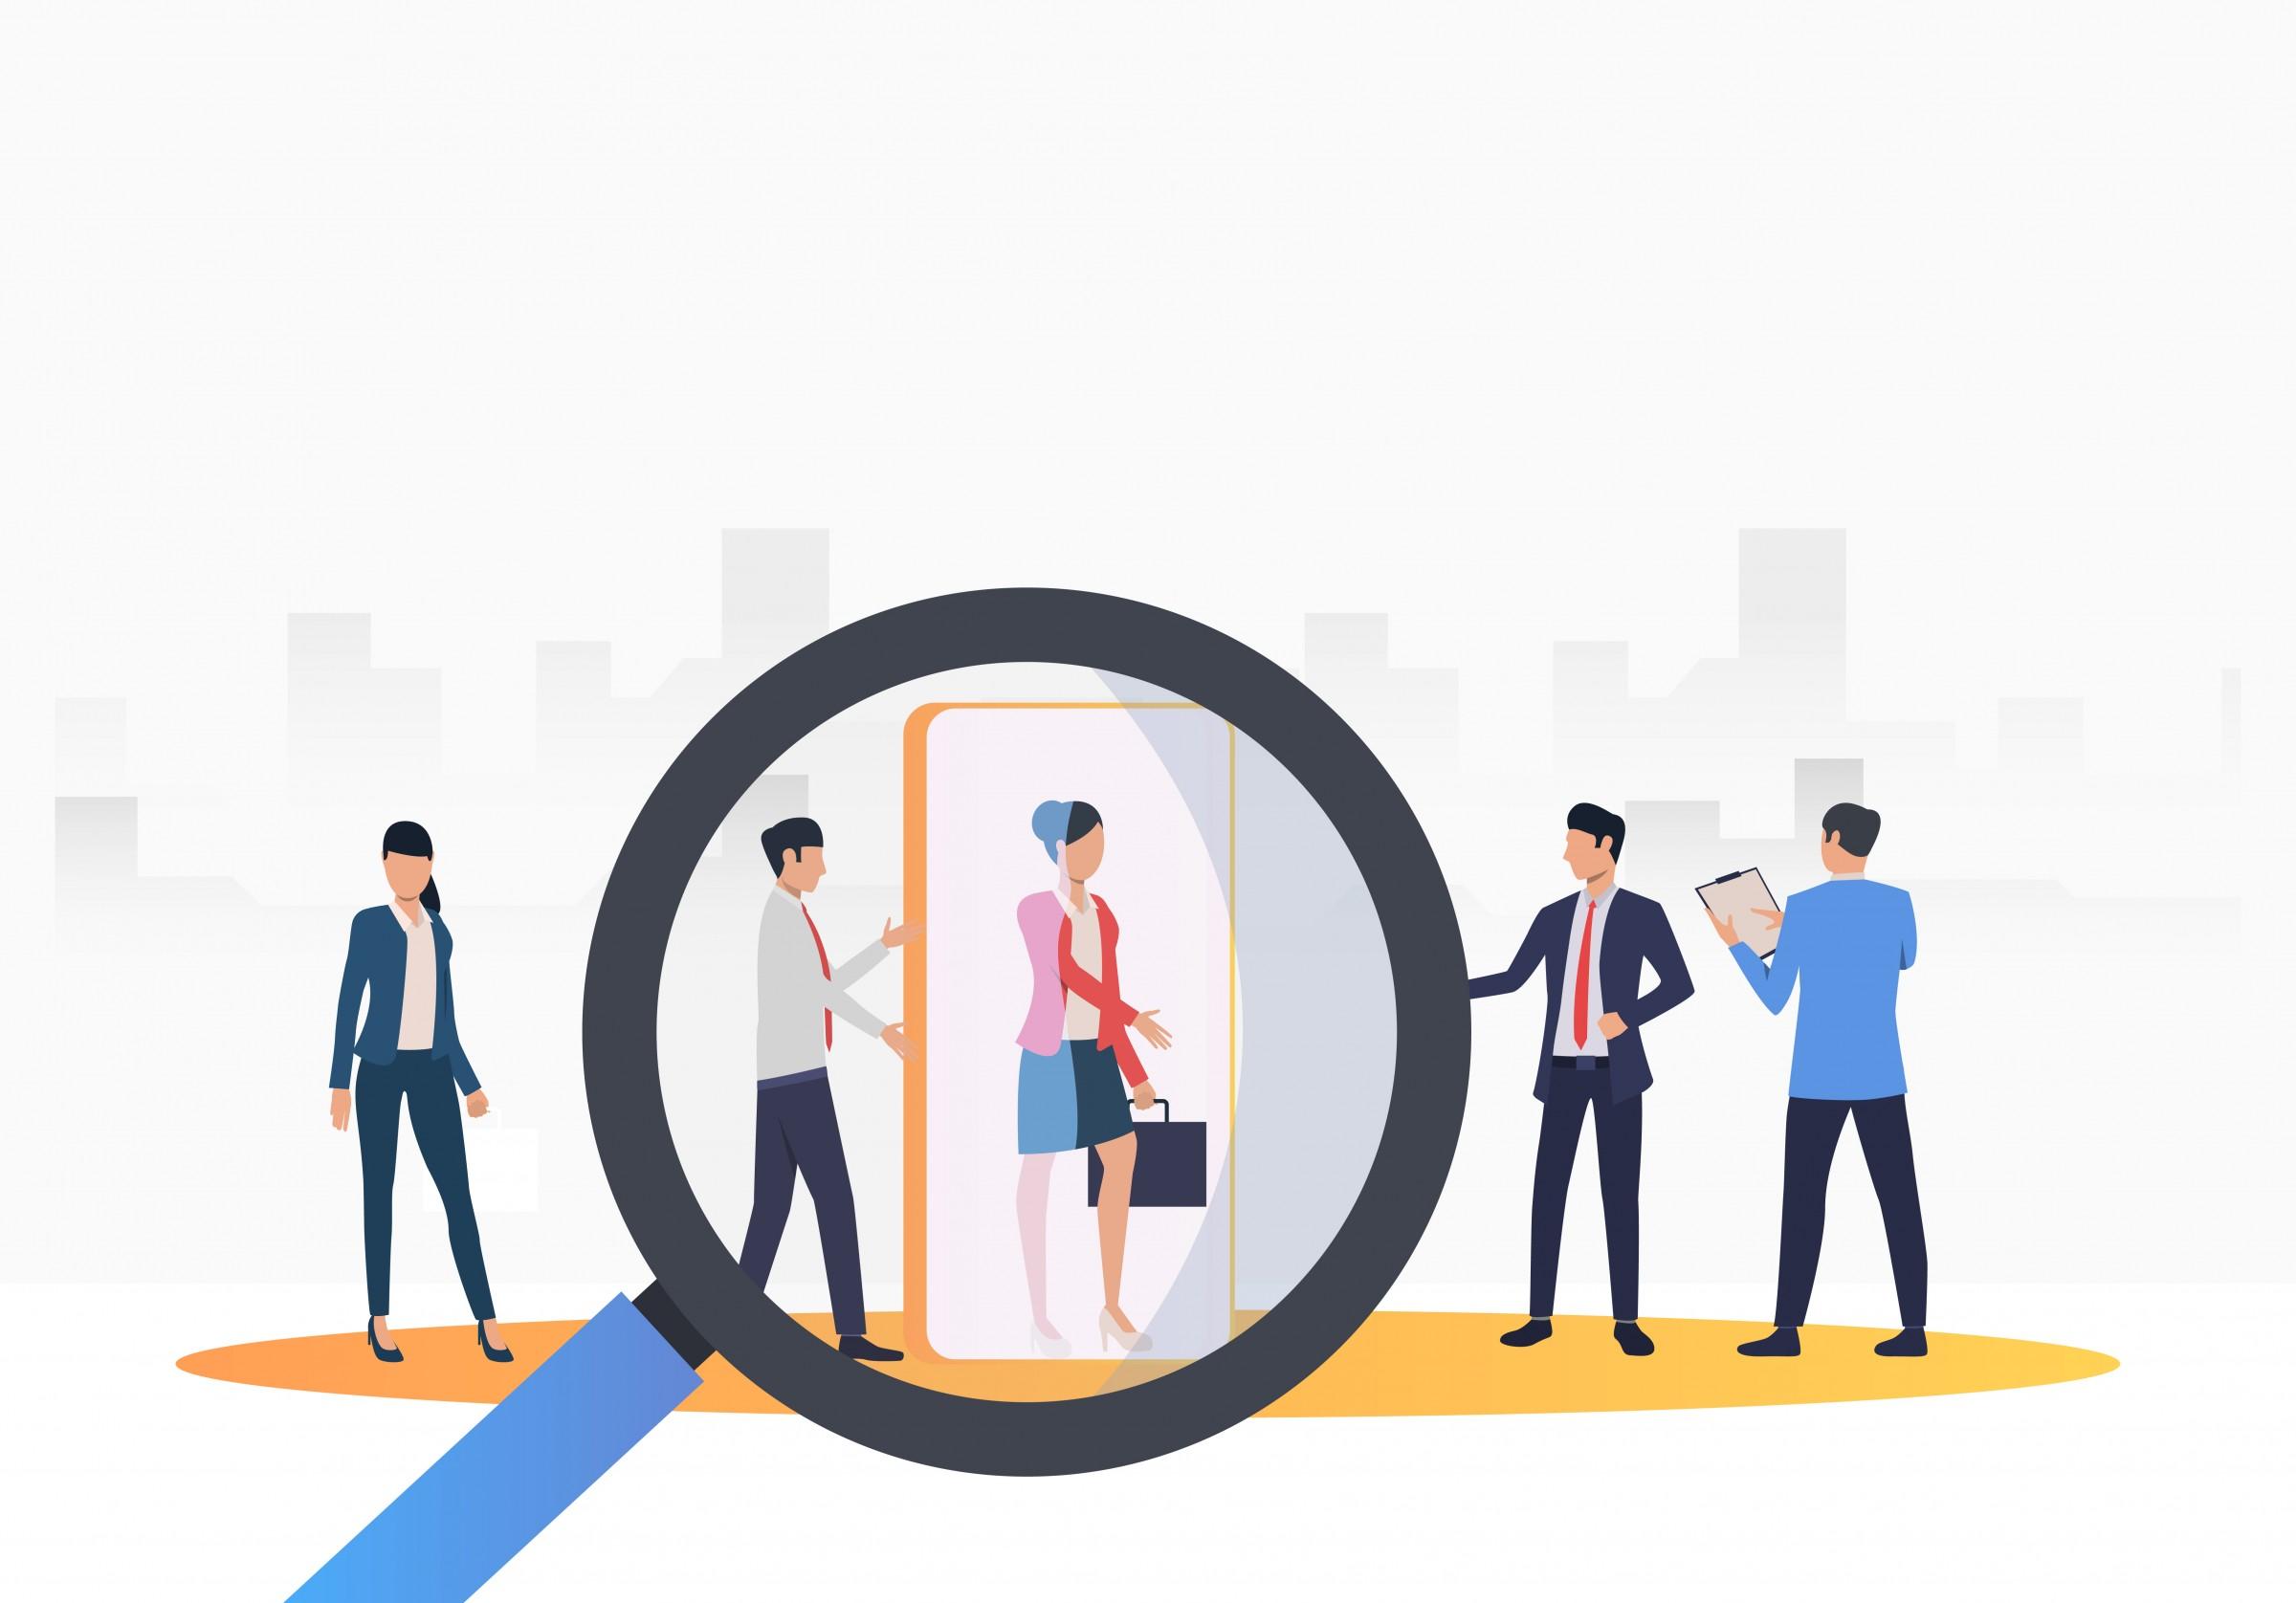 hiring a diverse workforce in tech companies